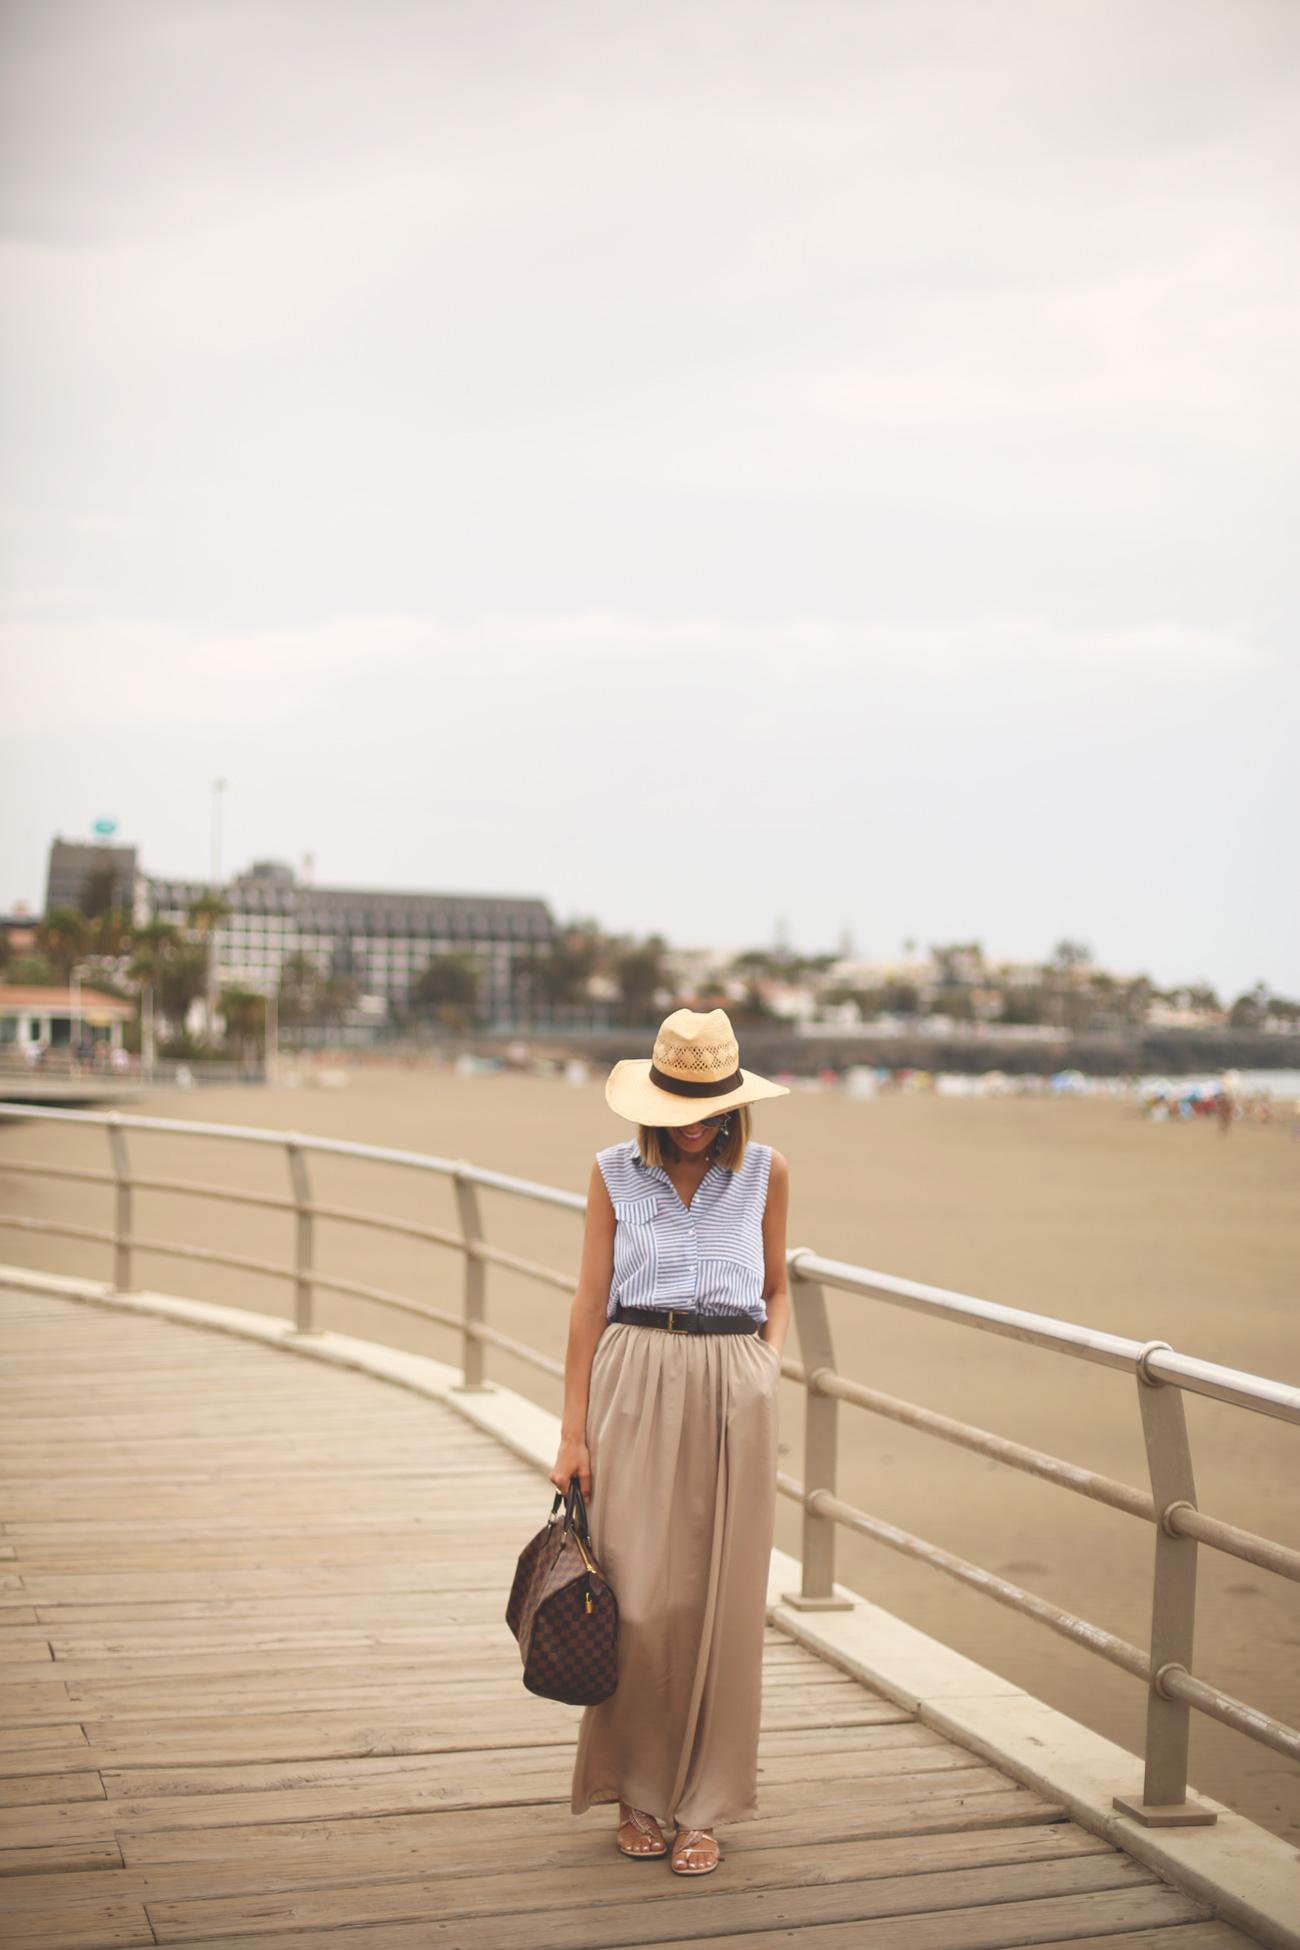 Palazzo, maxi skirt, beige, hat, sunnies, cutler gross, speedy, Louis Vuitton, Tous, Jewelry, sandals, deichmann